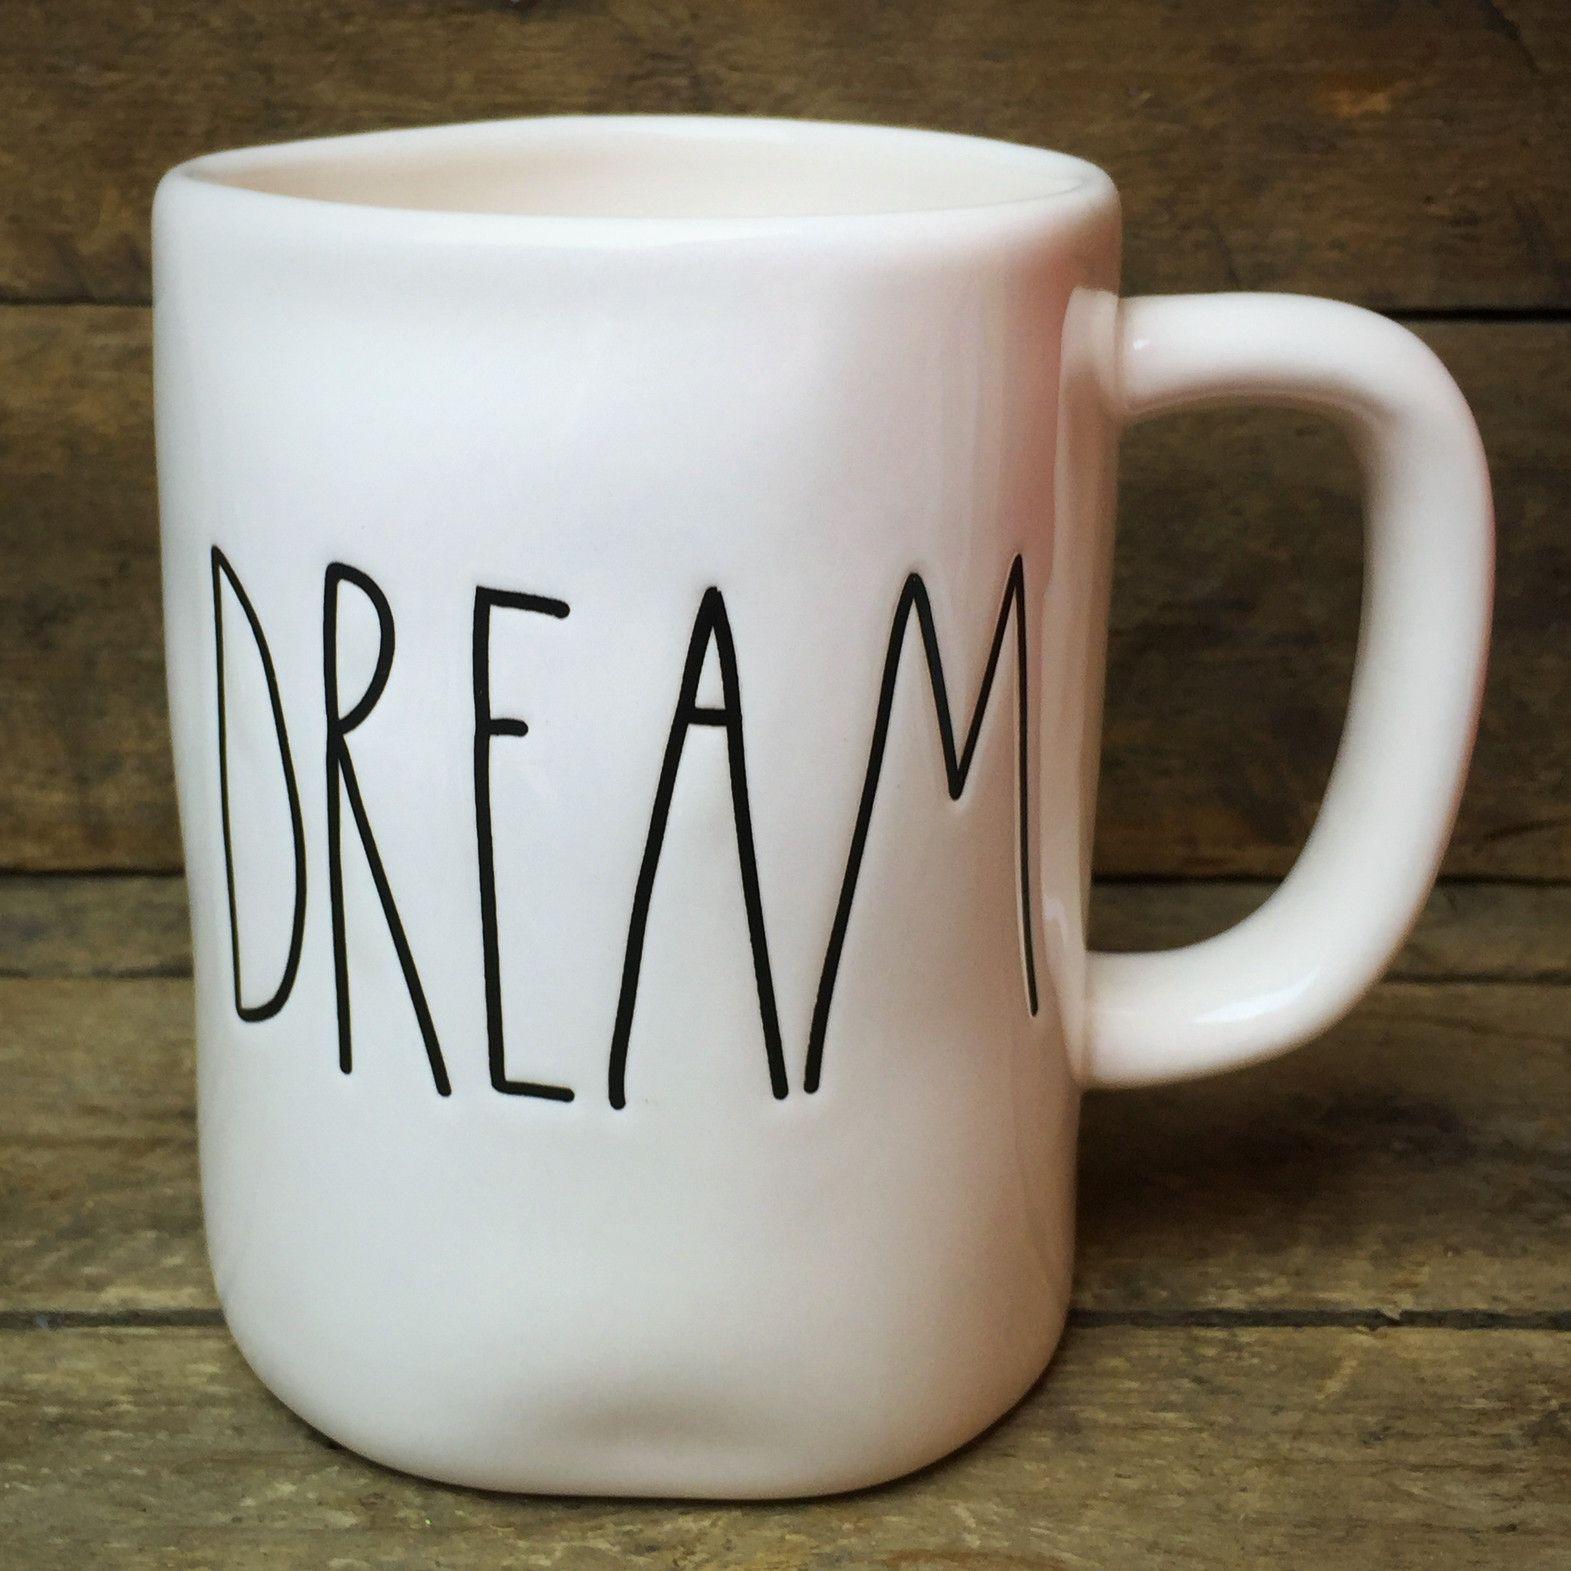 dream coffee mug magentarae dunn | craft booth ideas and